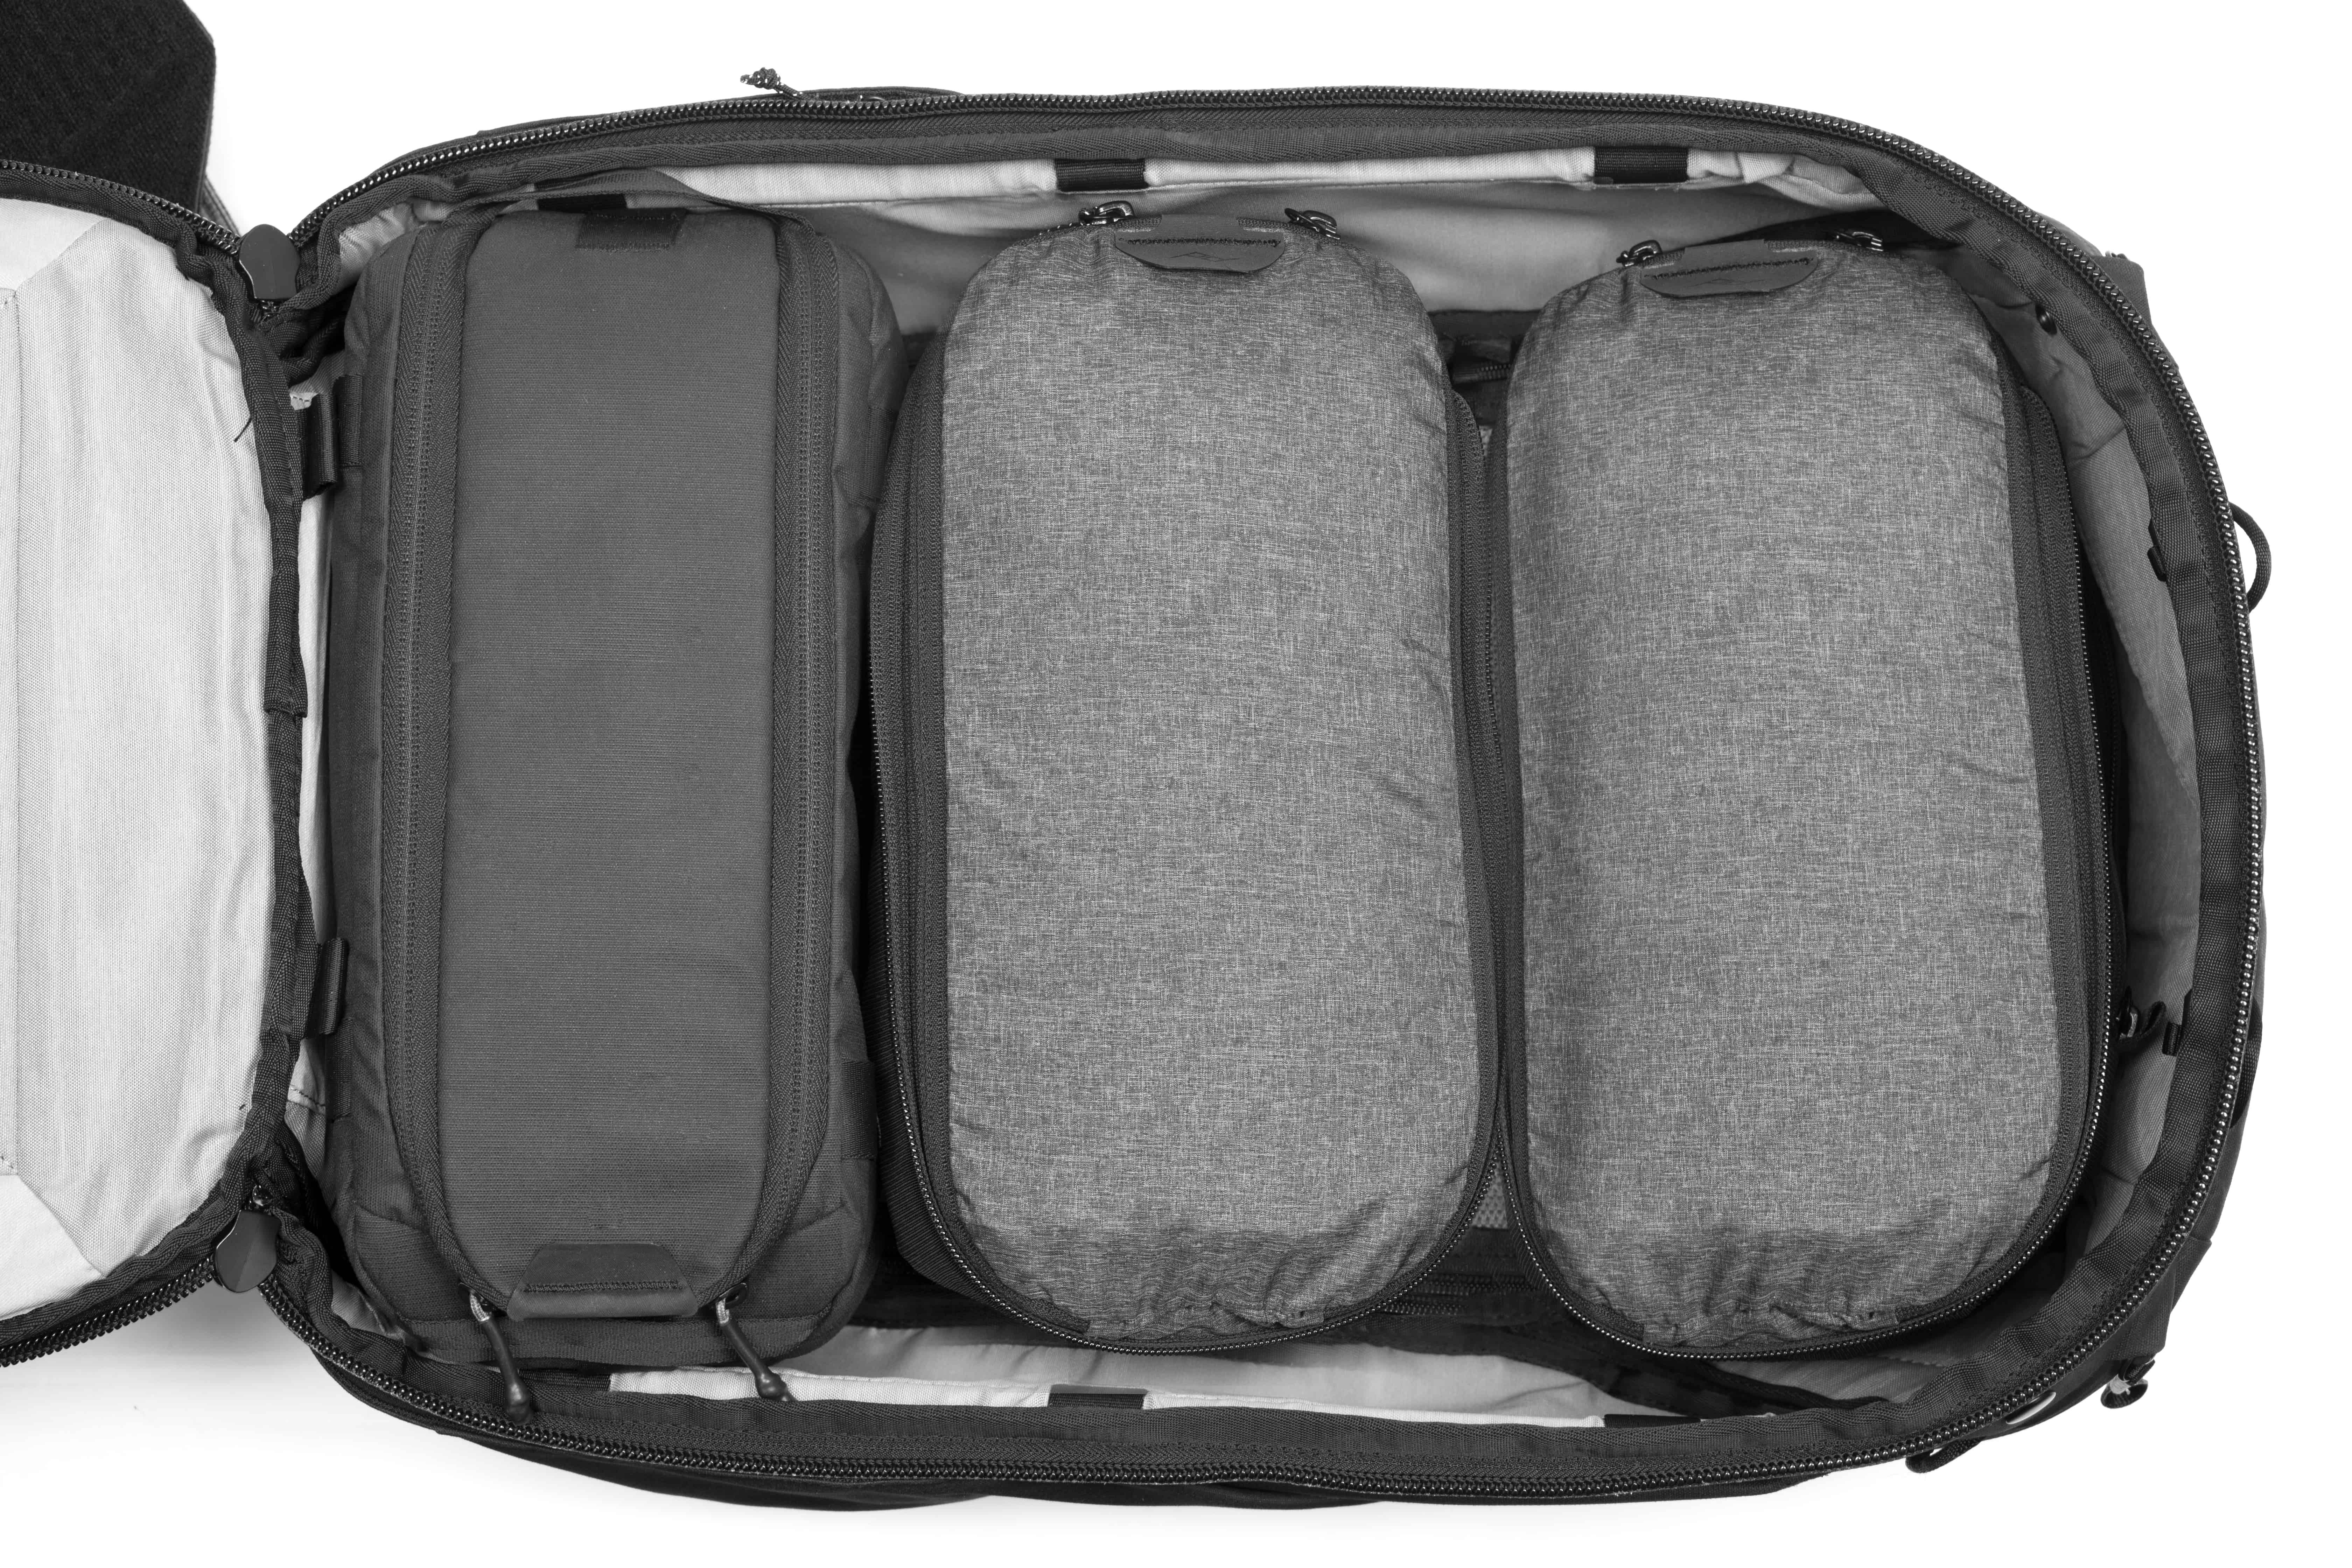 Peak Design Travel Line Packing Cubes